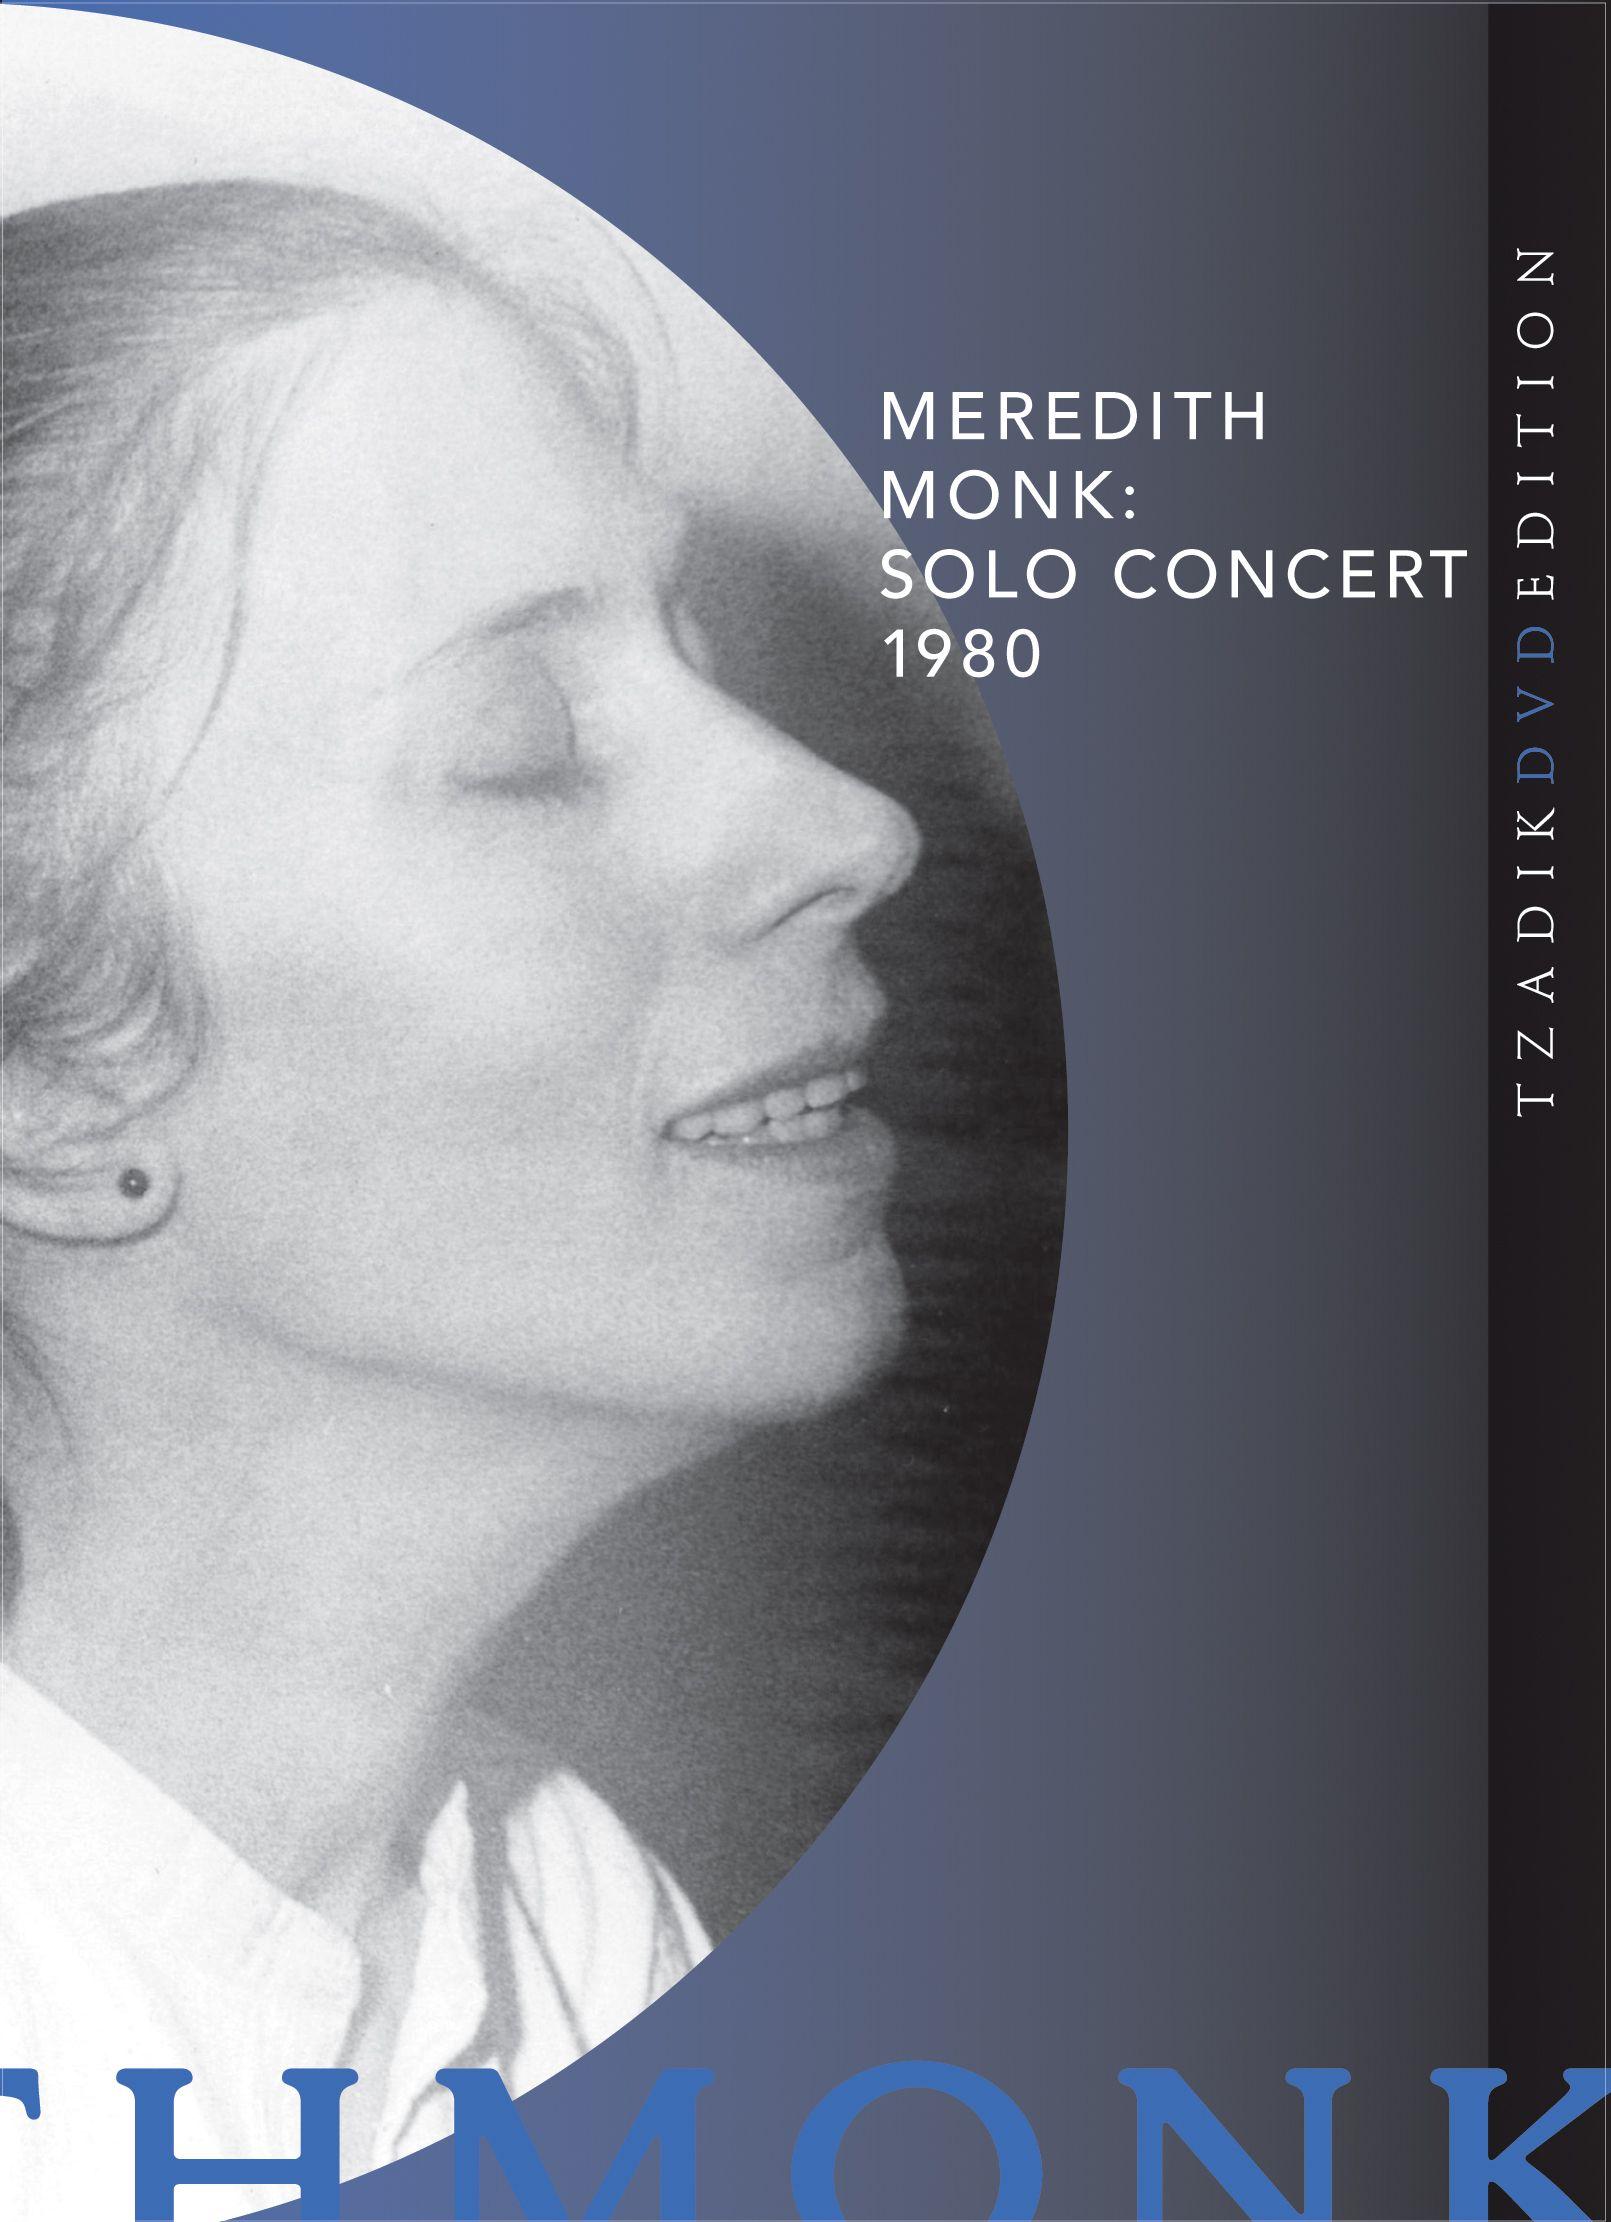 Meredith Monk: Solo Concert 1980